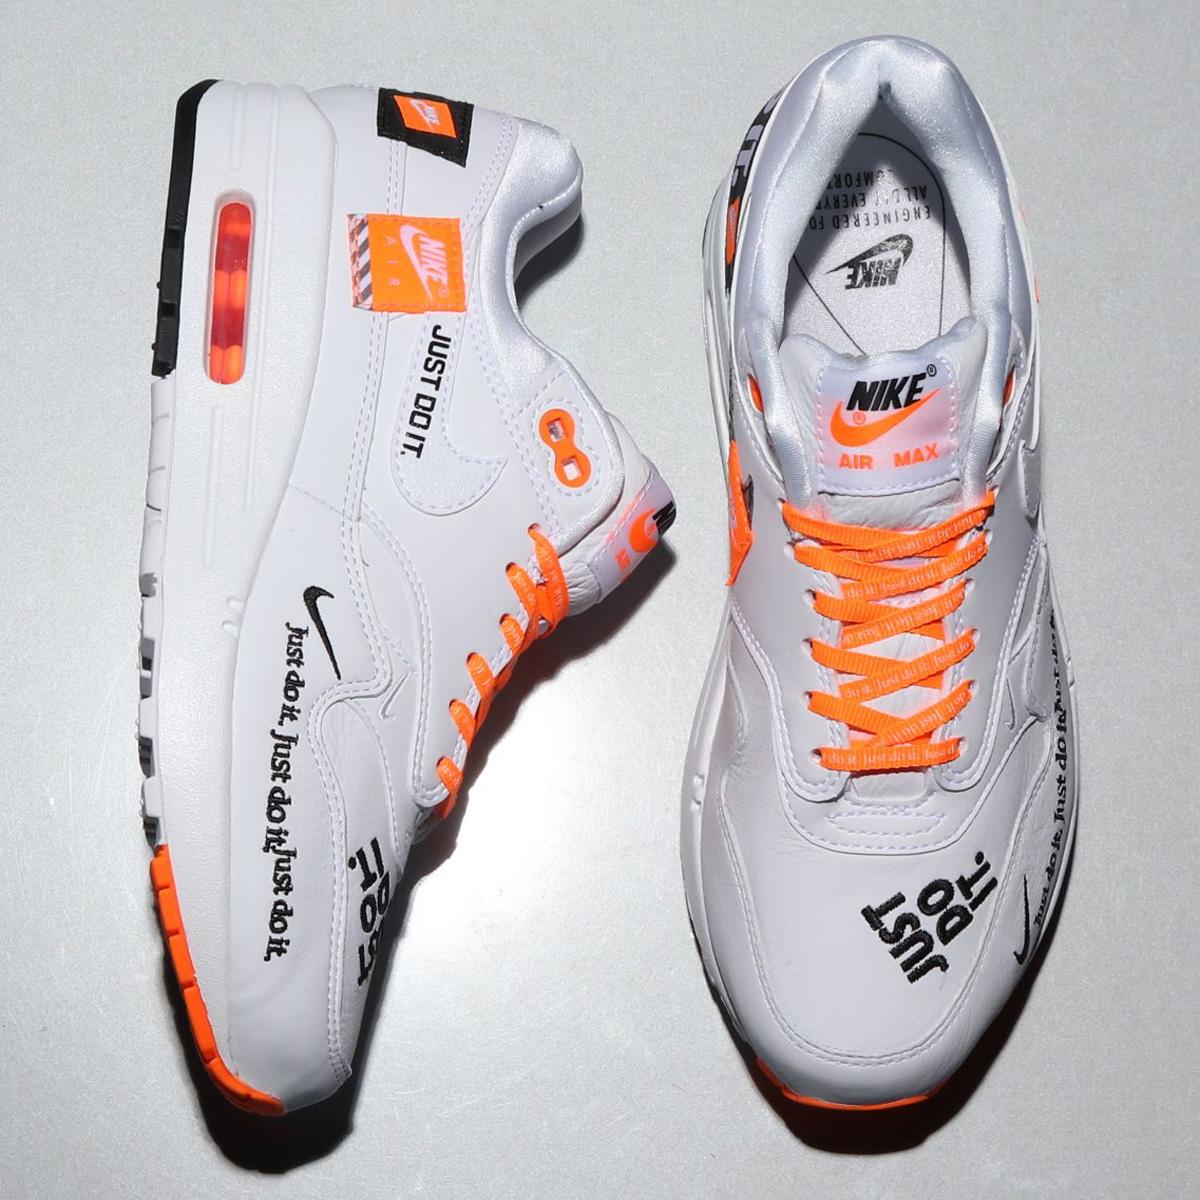 628 9:00 発売 Nike W Air Max 1 LX 'JDI ' 917691 800 917691